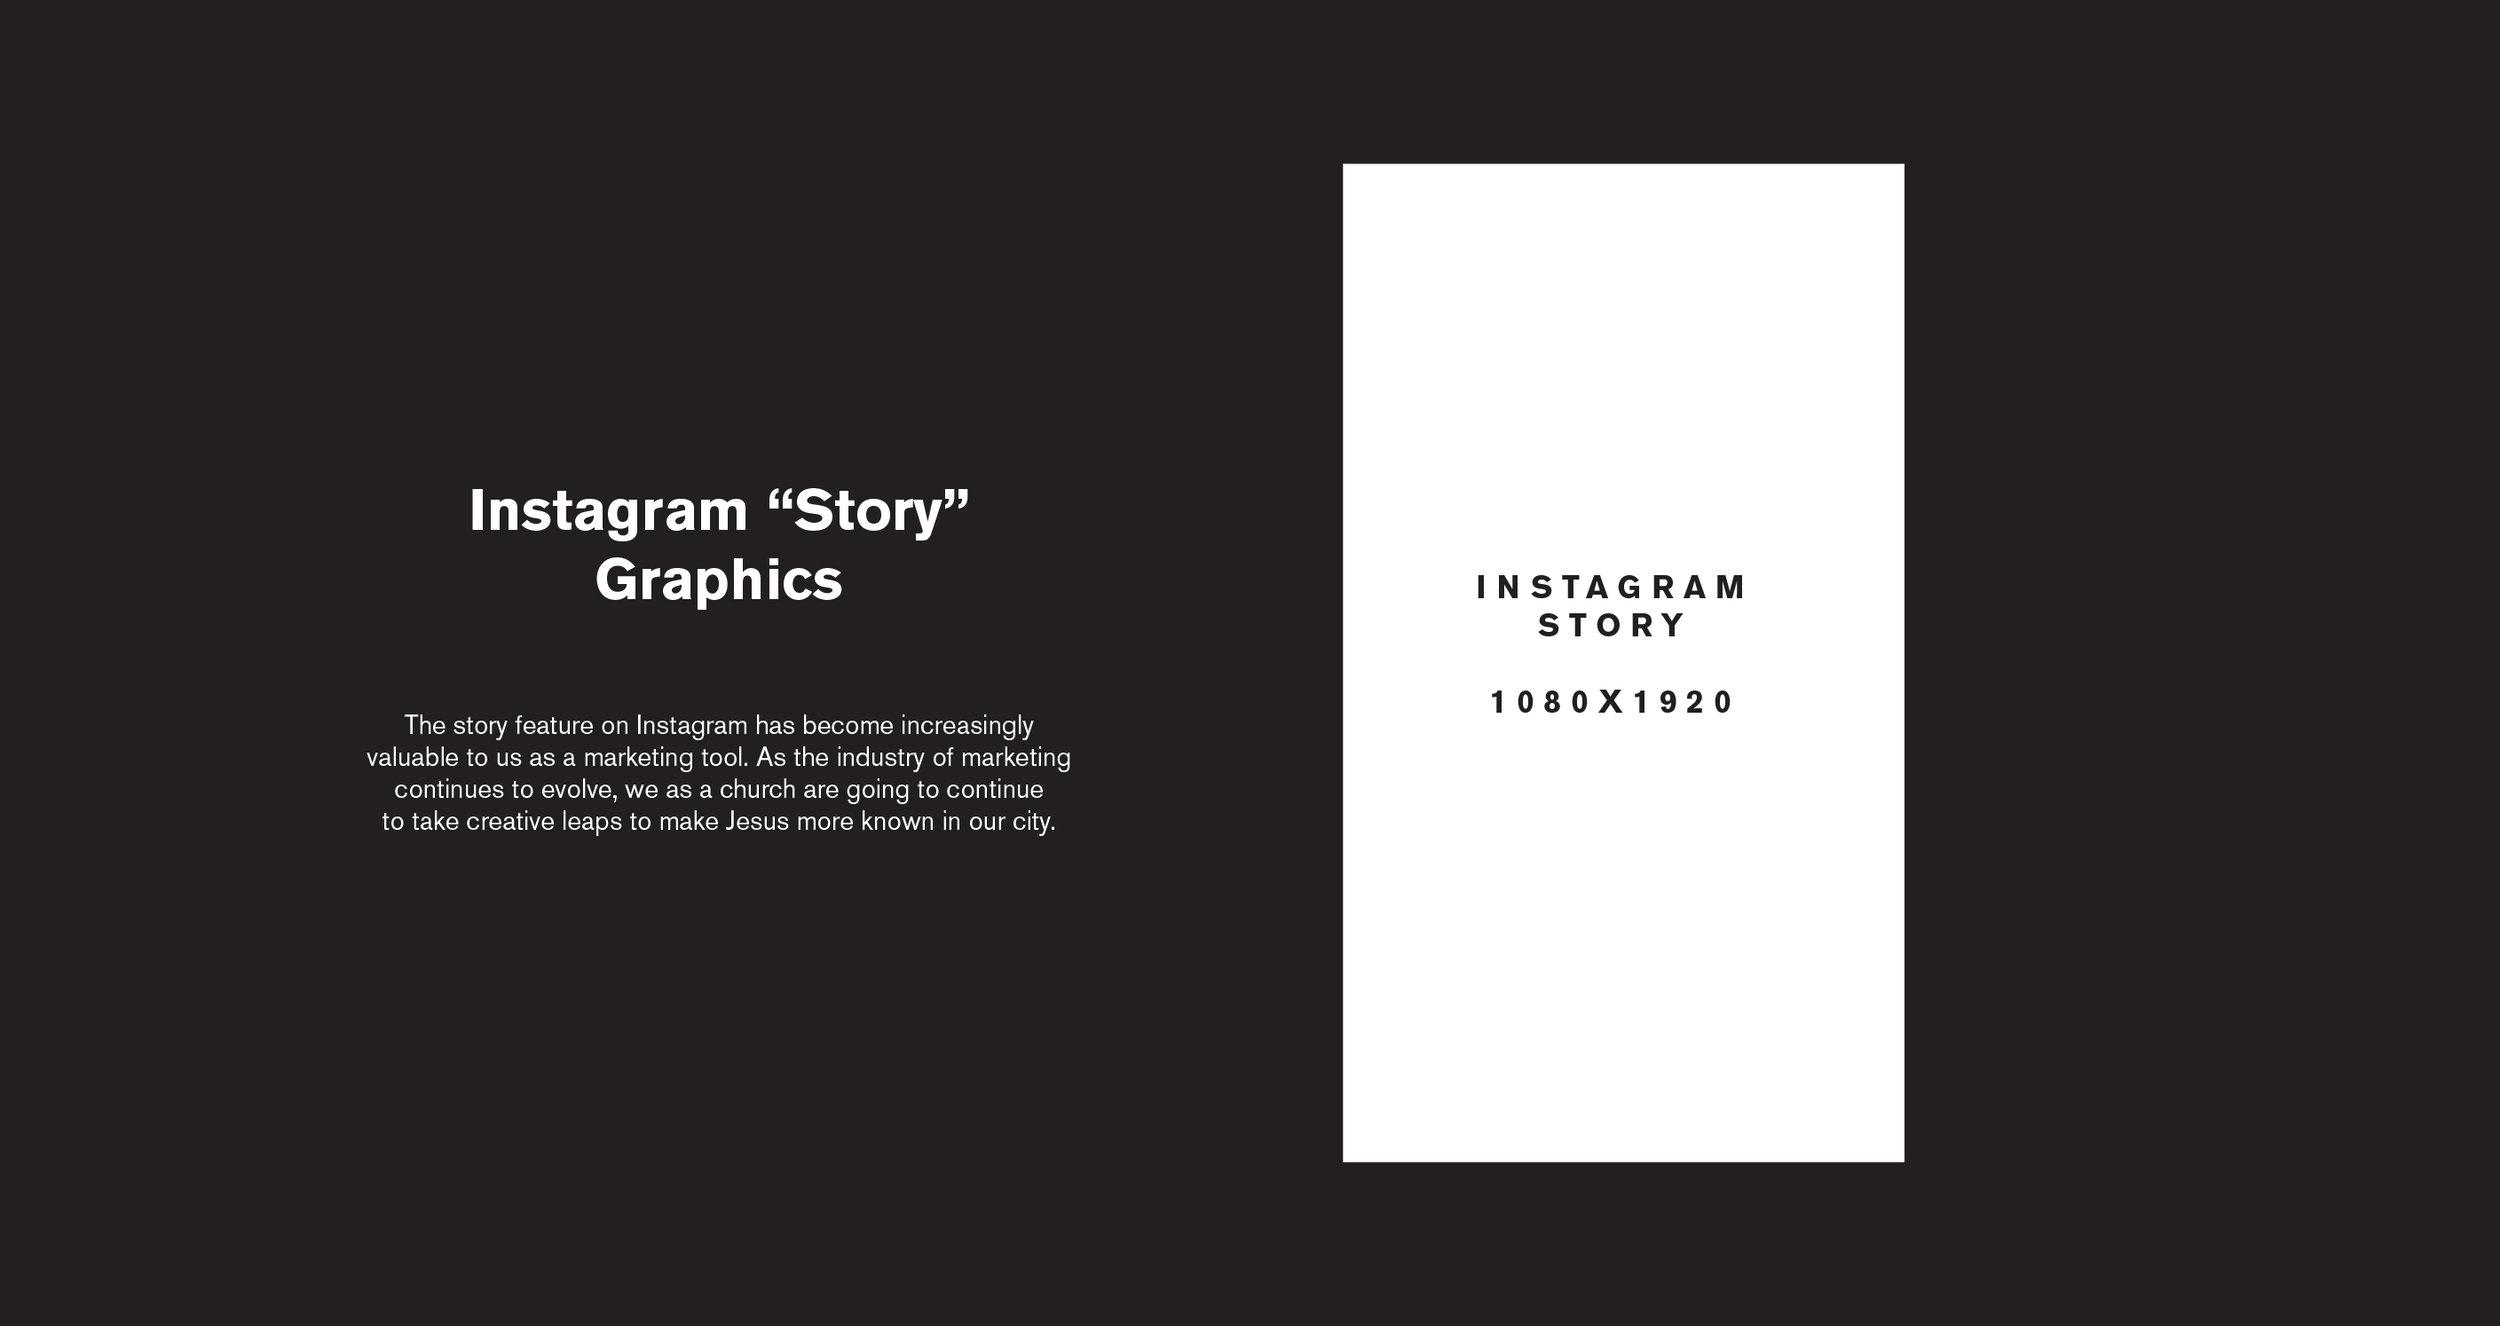 Cause_SocialMarketingGraphics_Guide_Story1.jpg